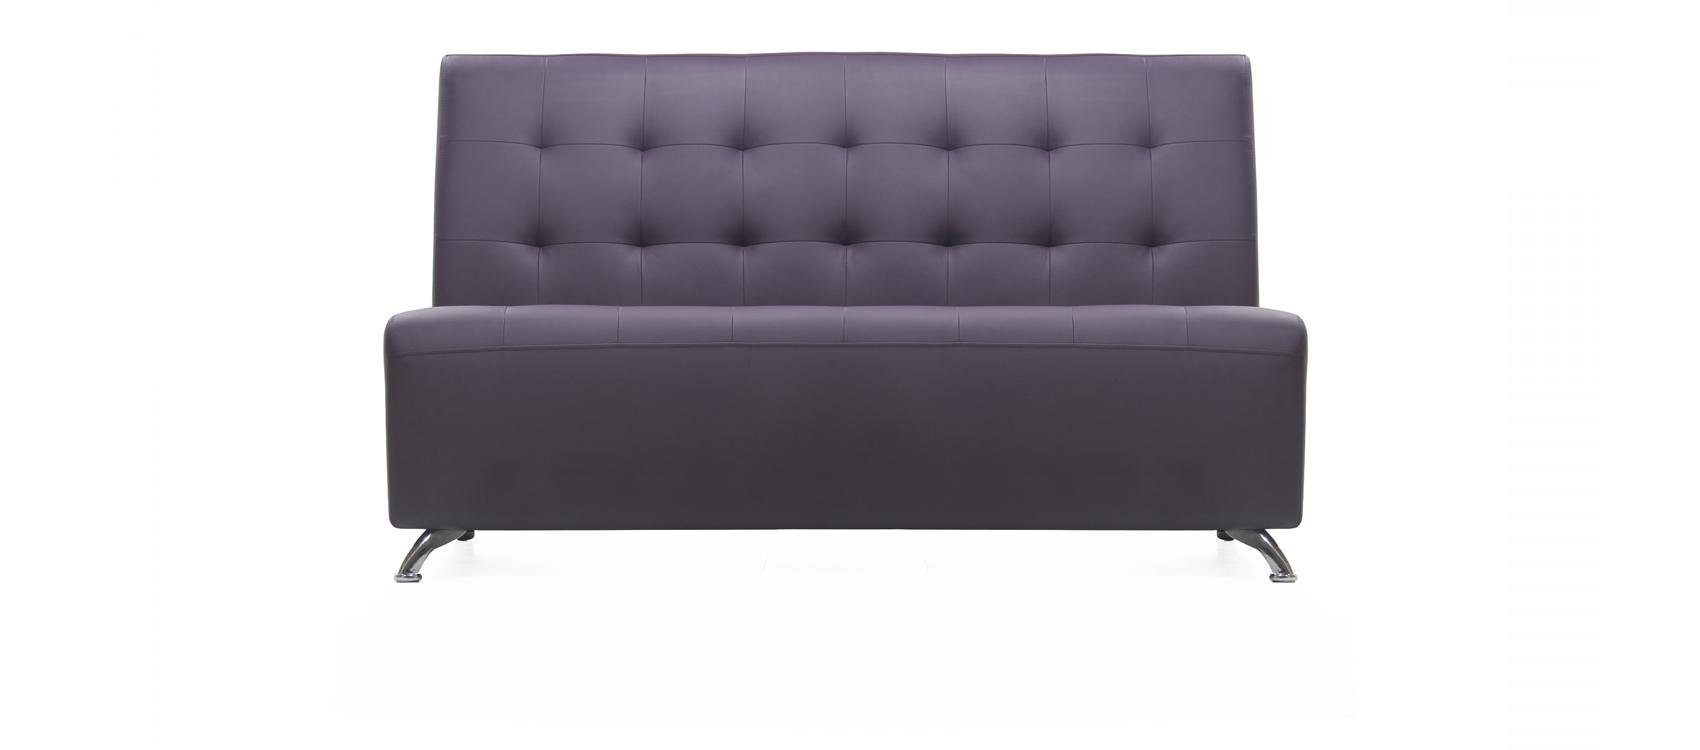 Sofa TOWN фото 2